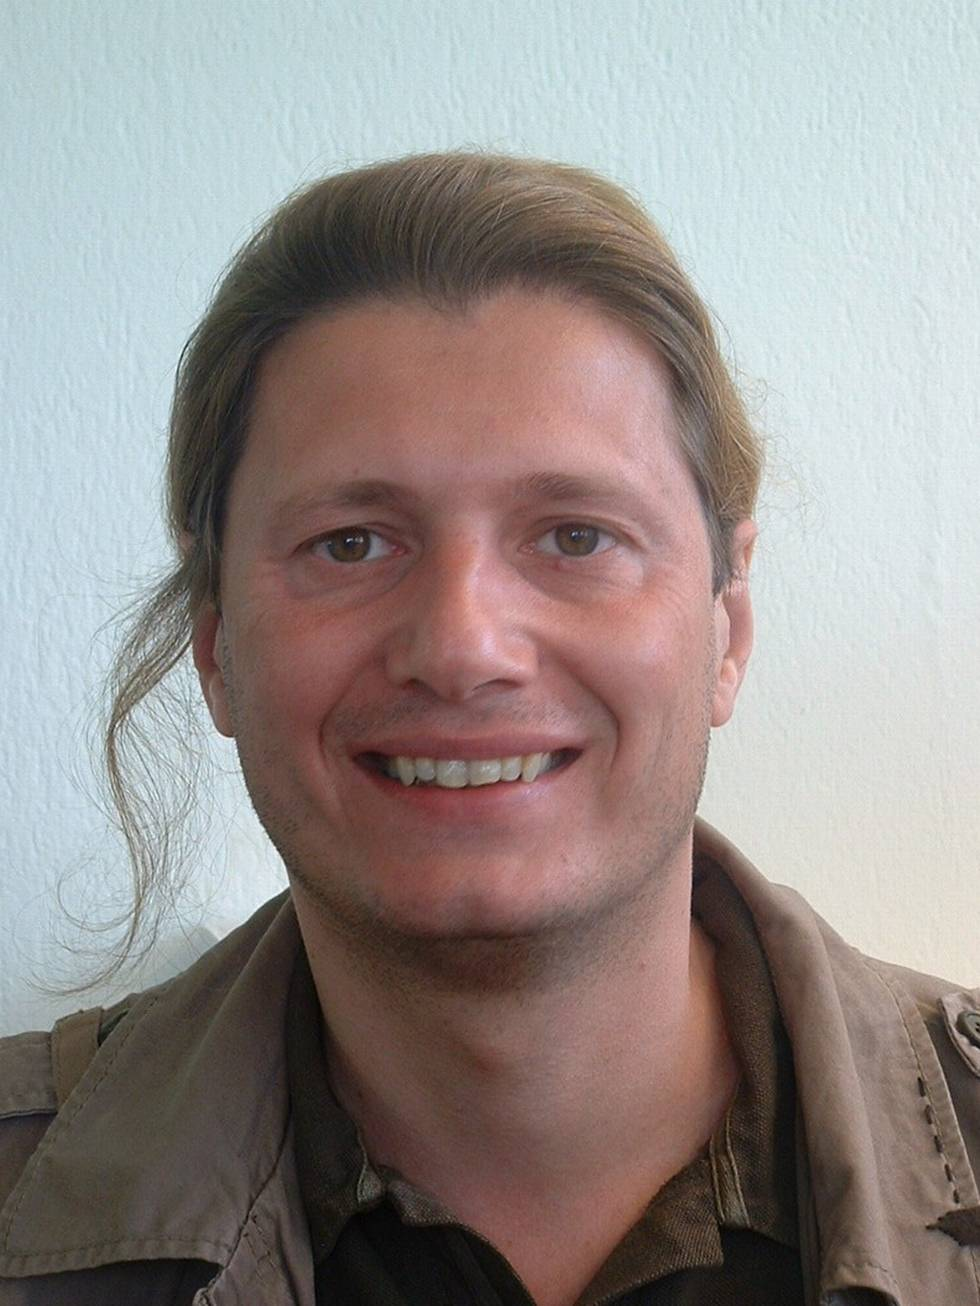 Oscar Acciari